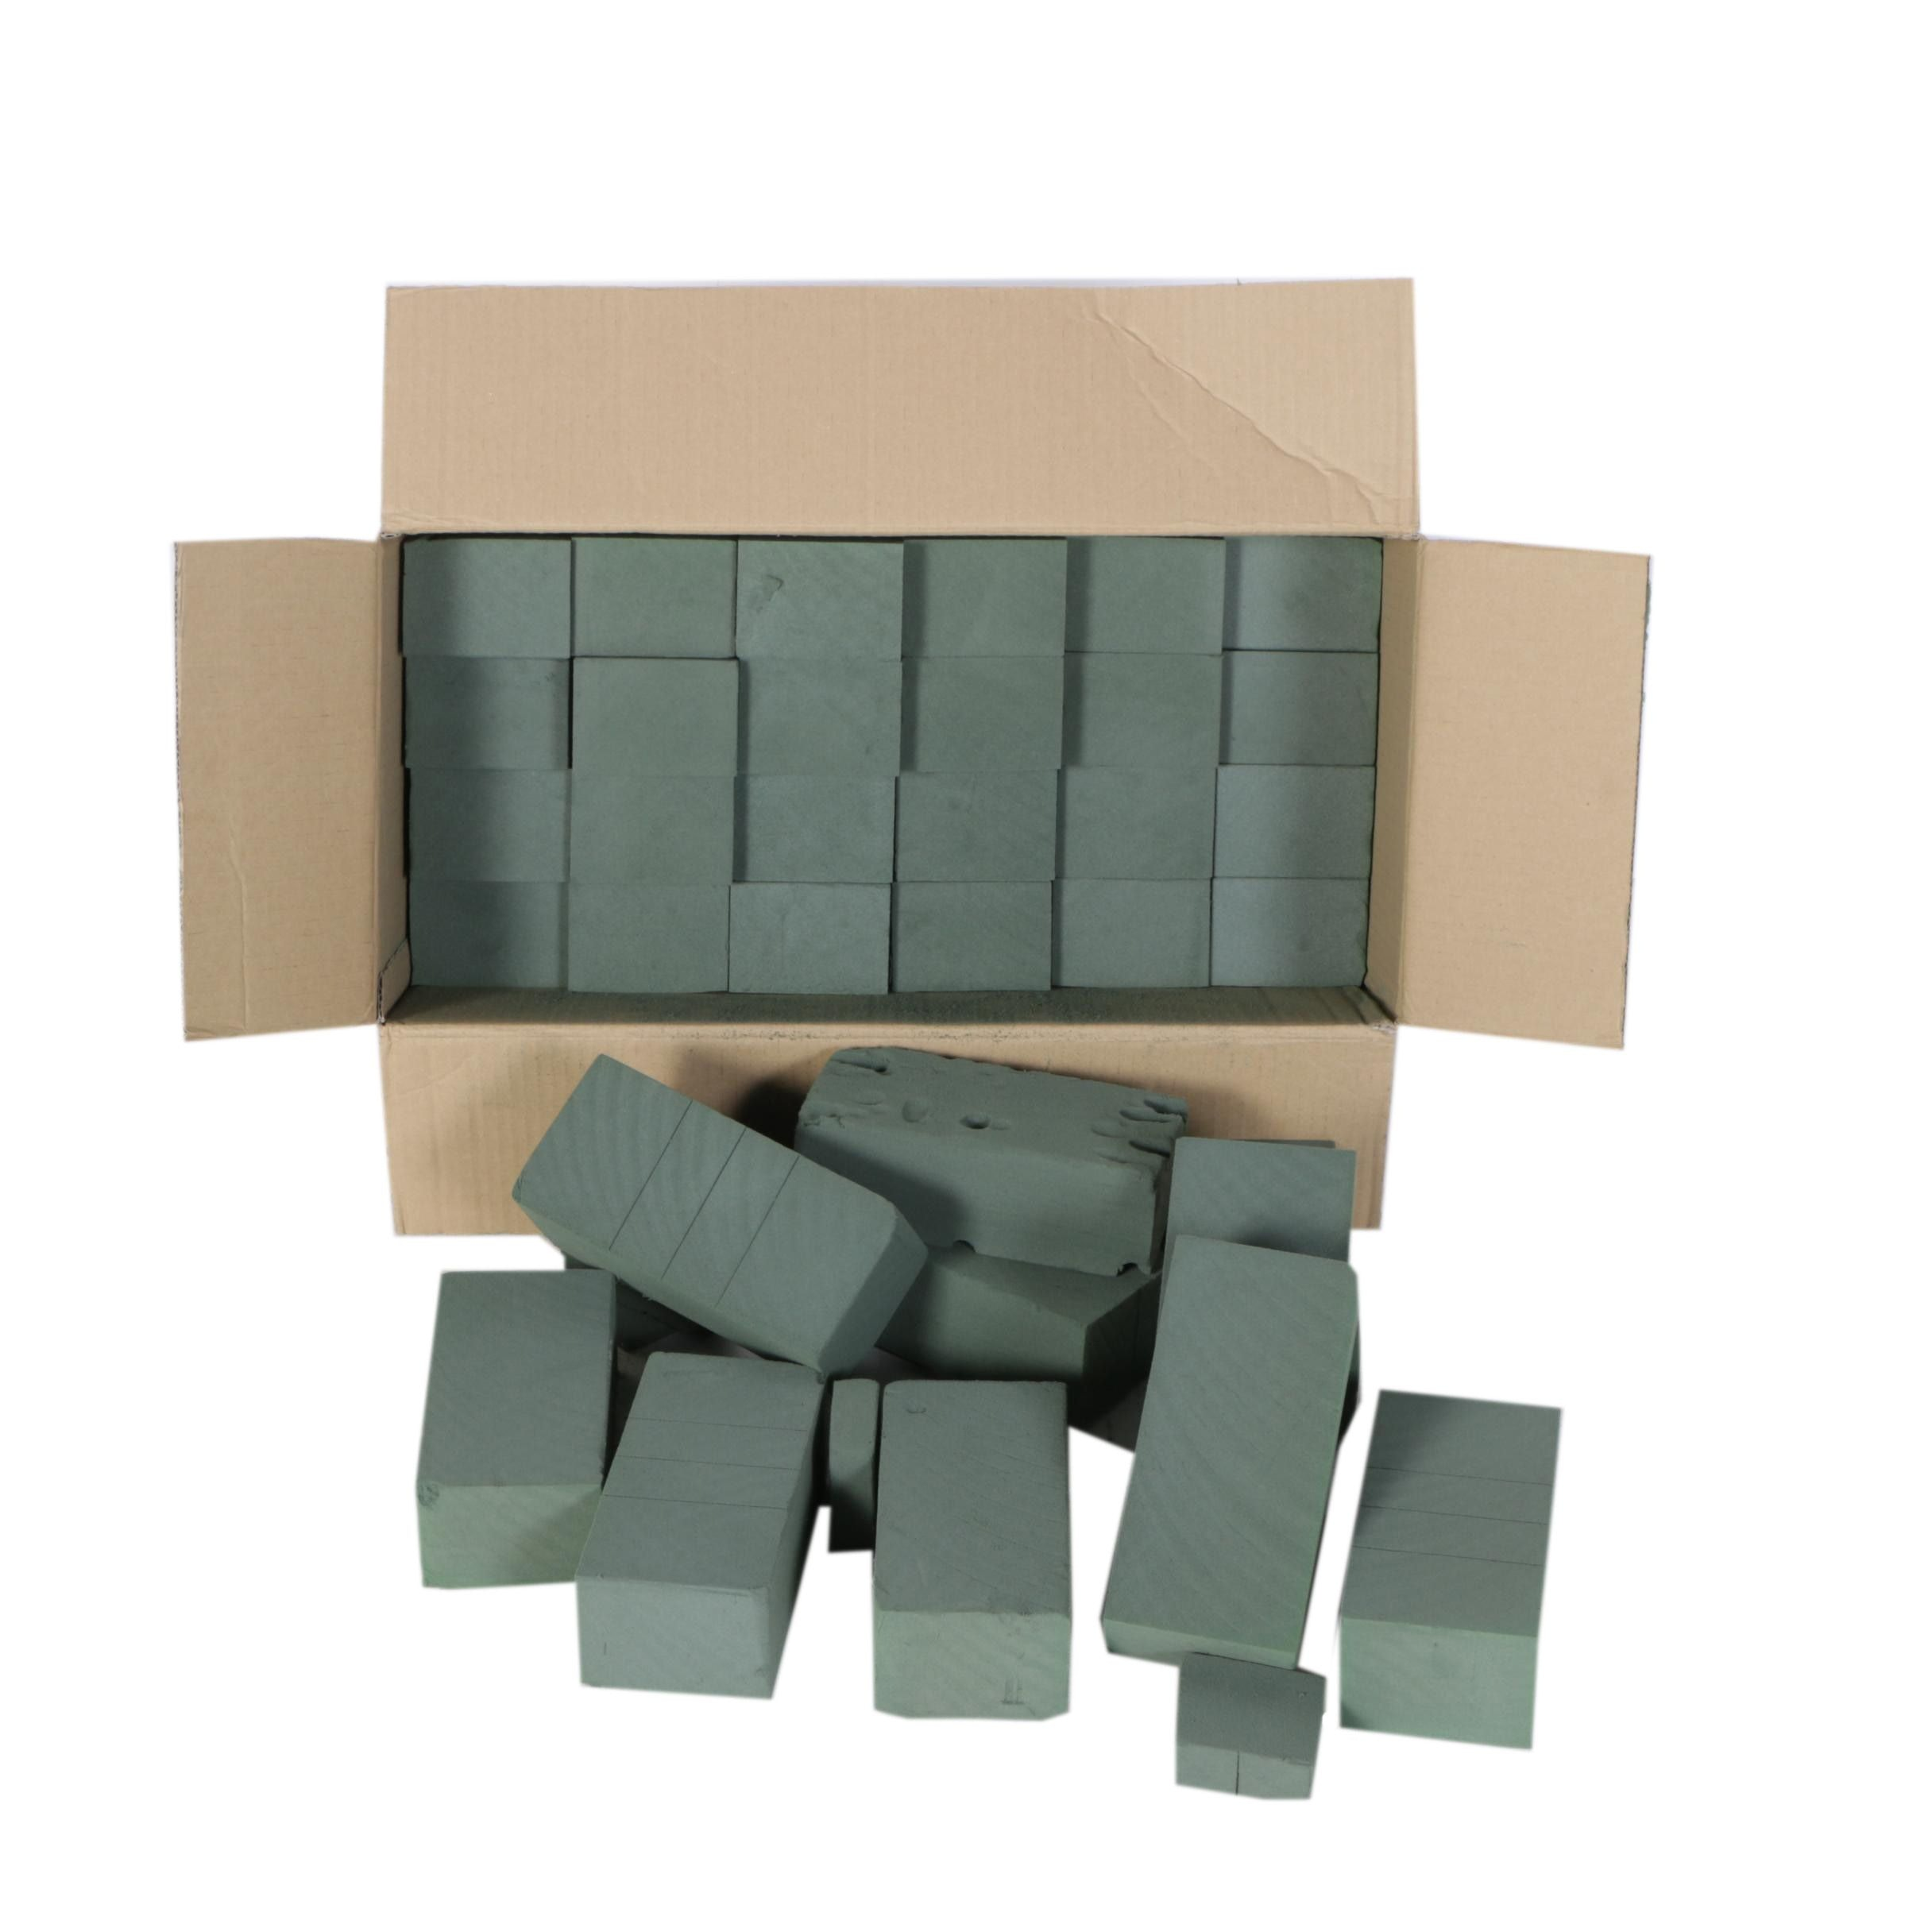 Box of Cool Brick Floral Foam